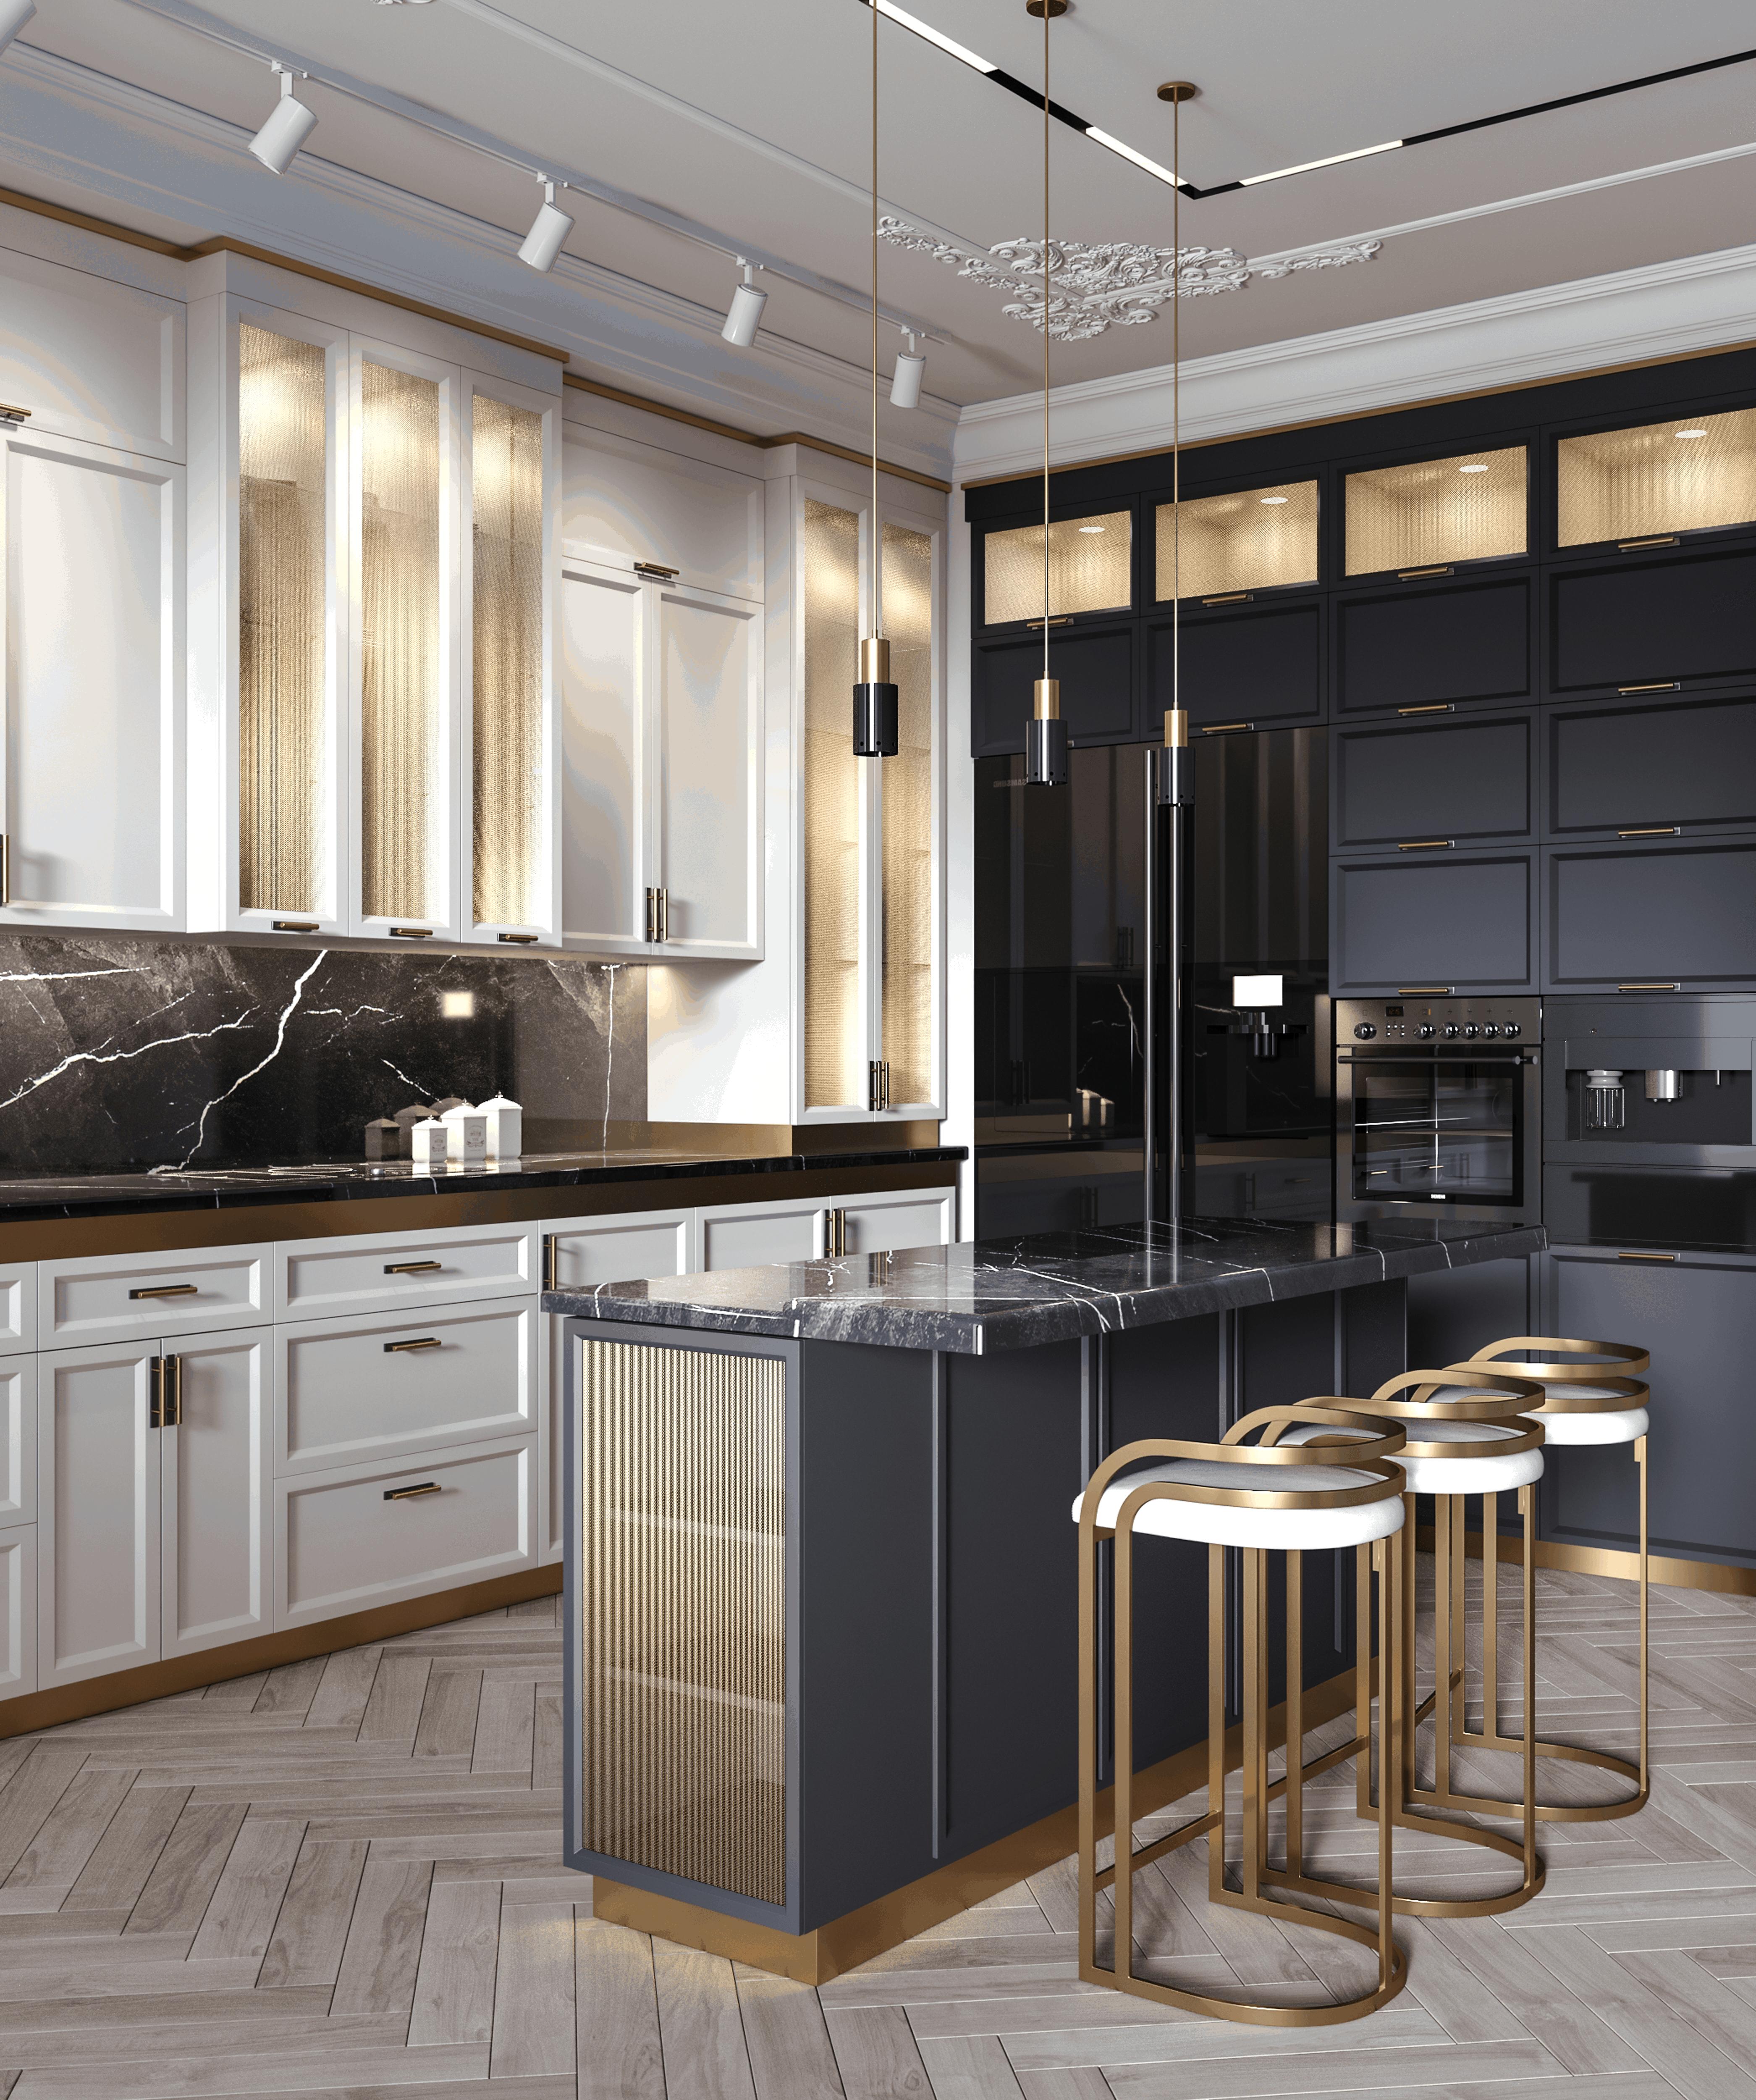 Кухня KT005 Any-Home - KT005 | AnyHome.ru